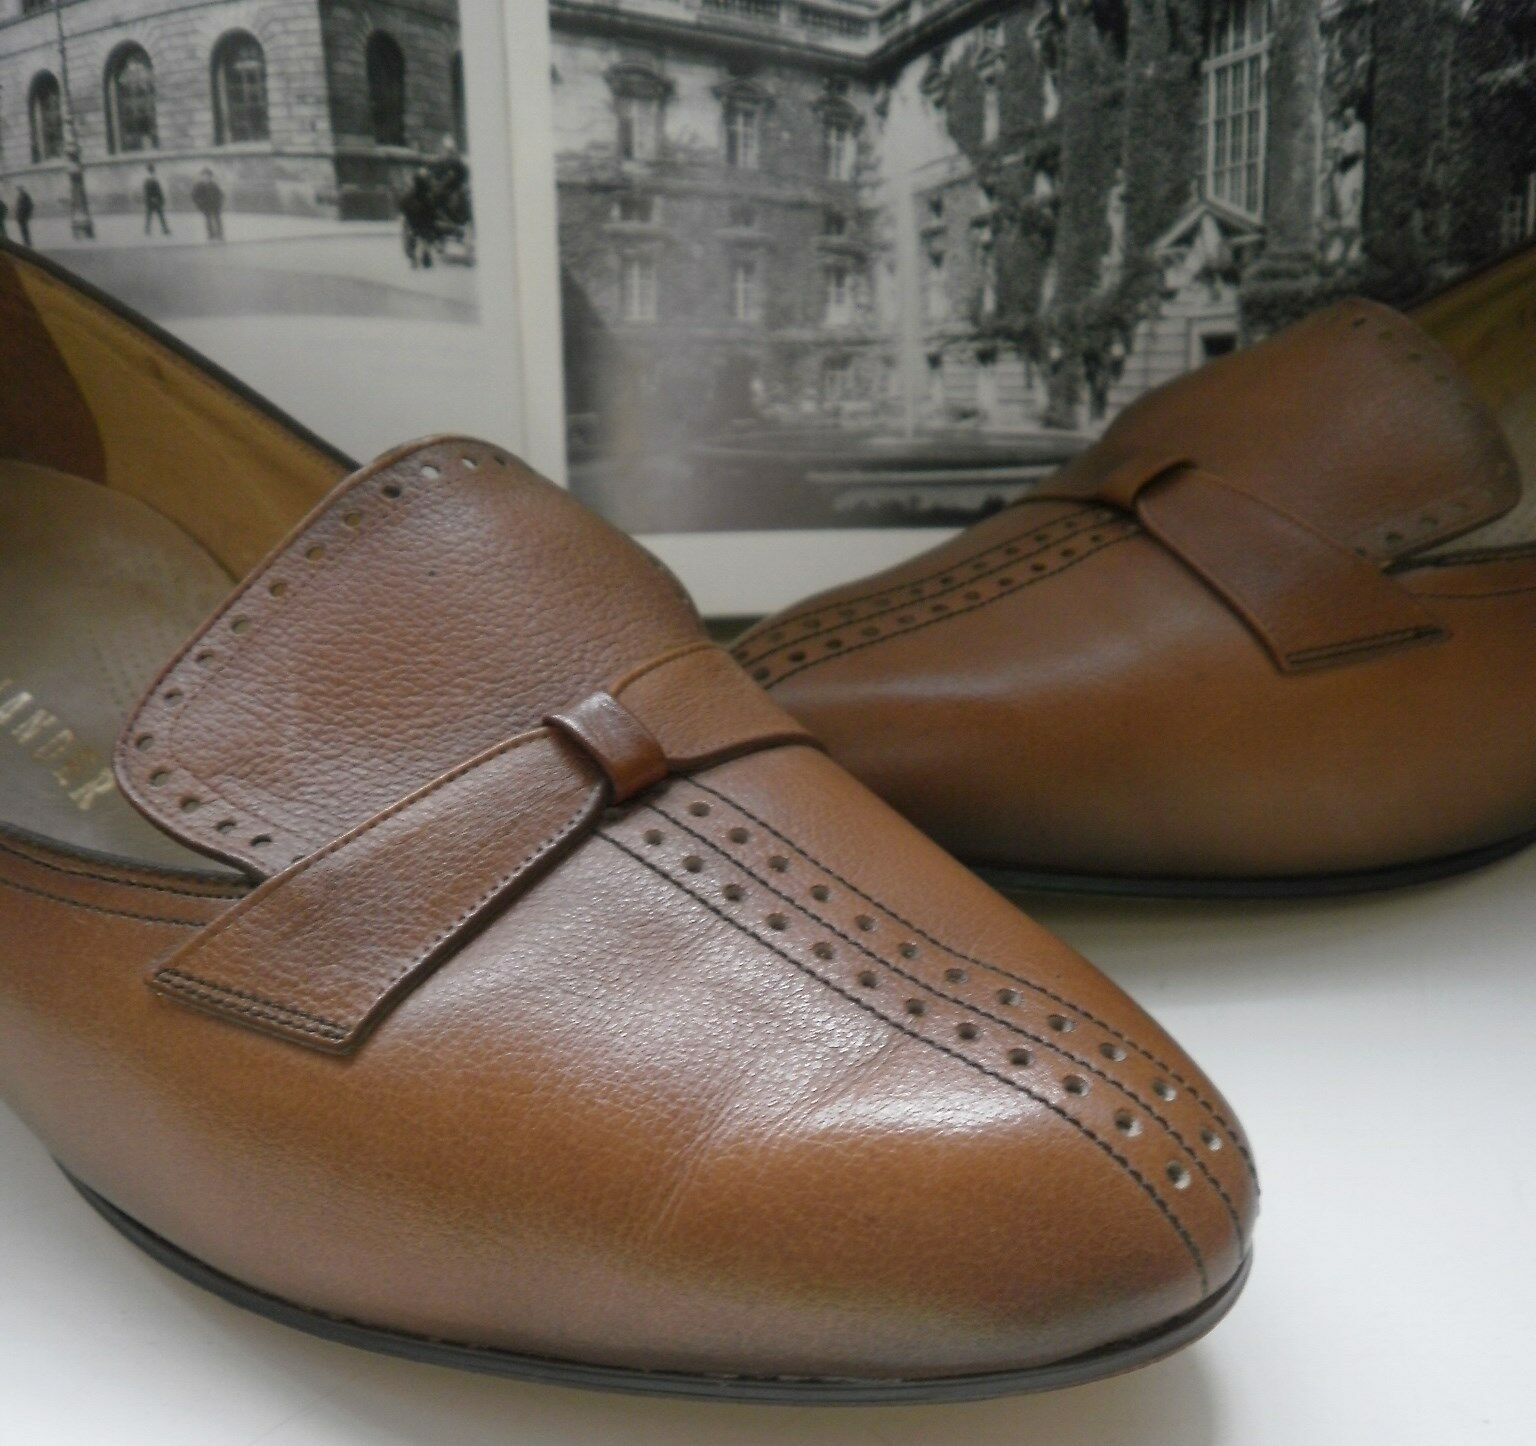 COMOD Damen Pumps SALAMANDER made Germany 50s TRUE VINTAGE Schuhe Halbschuhe 6,5